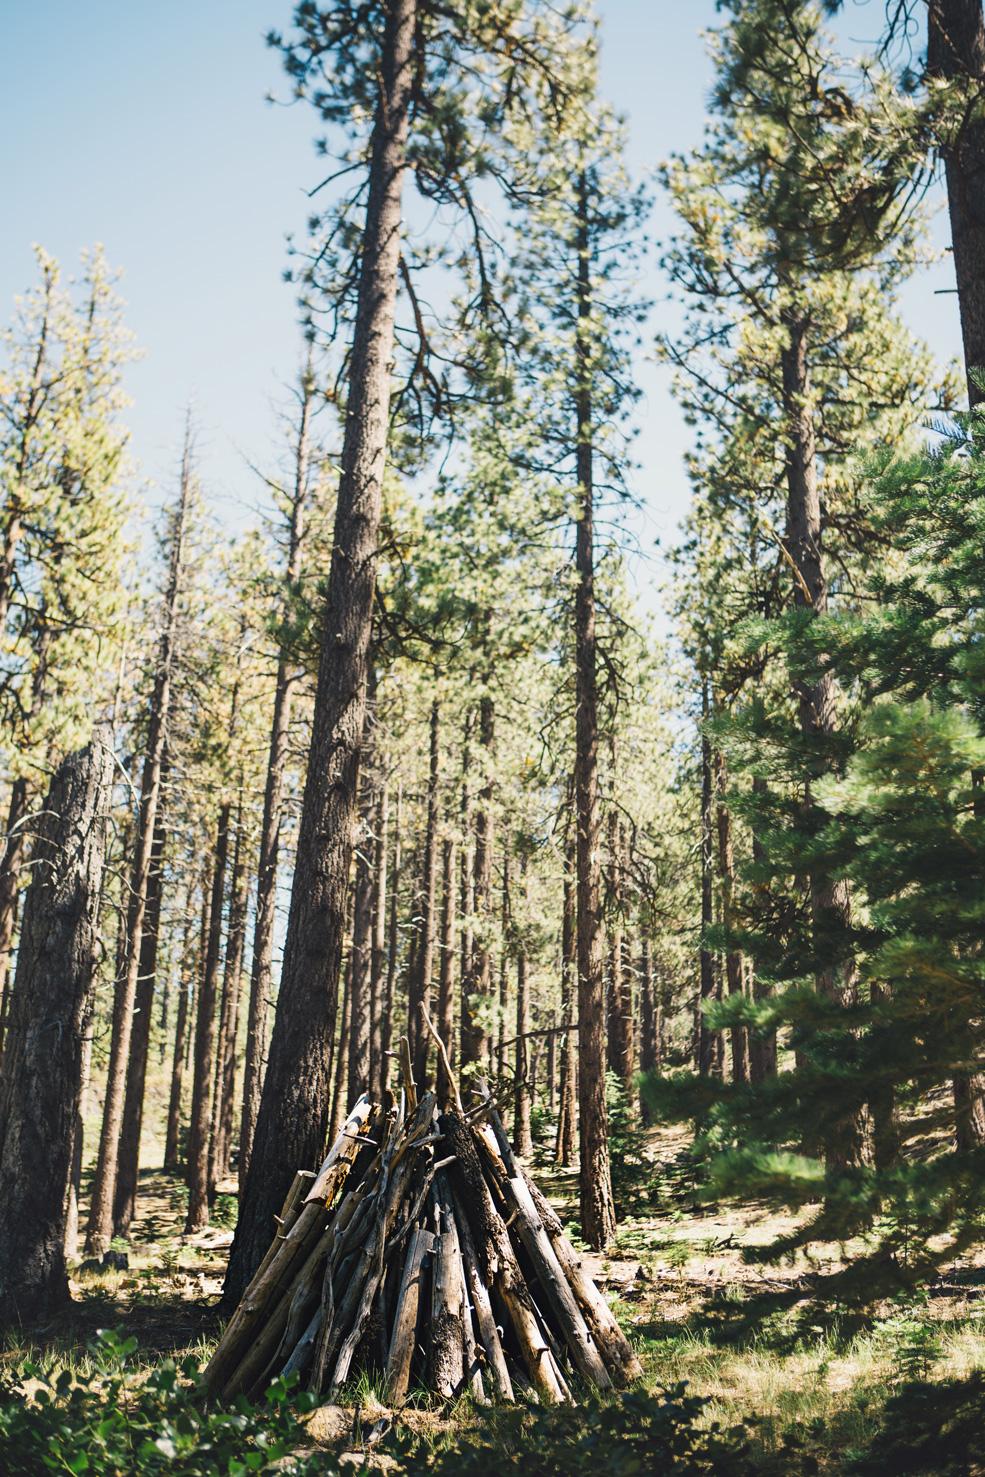 CindyGiovagnoli_Galena_Creek_Visitors_Center_hike_Reno_Tahoe_Nevada_outdoor_activities-004.jpg